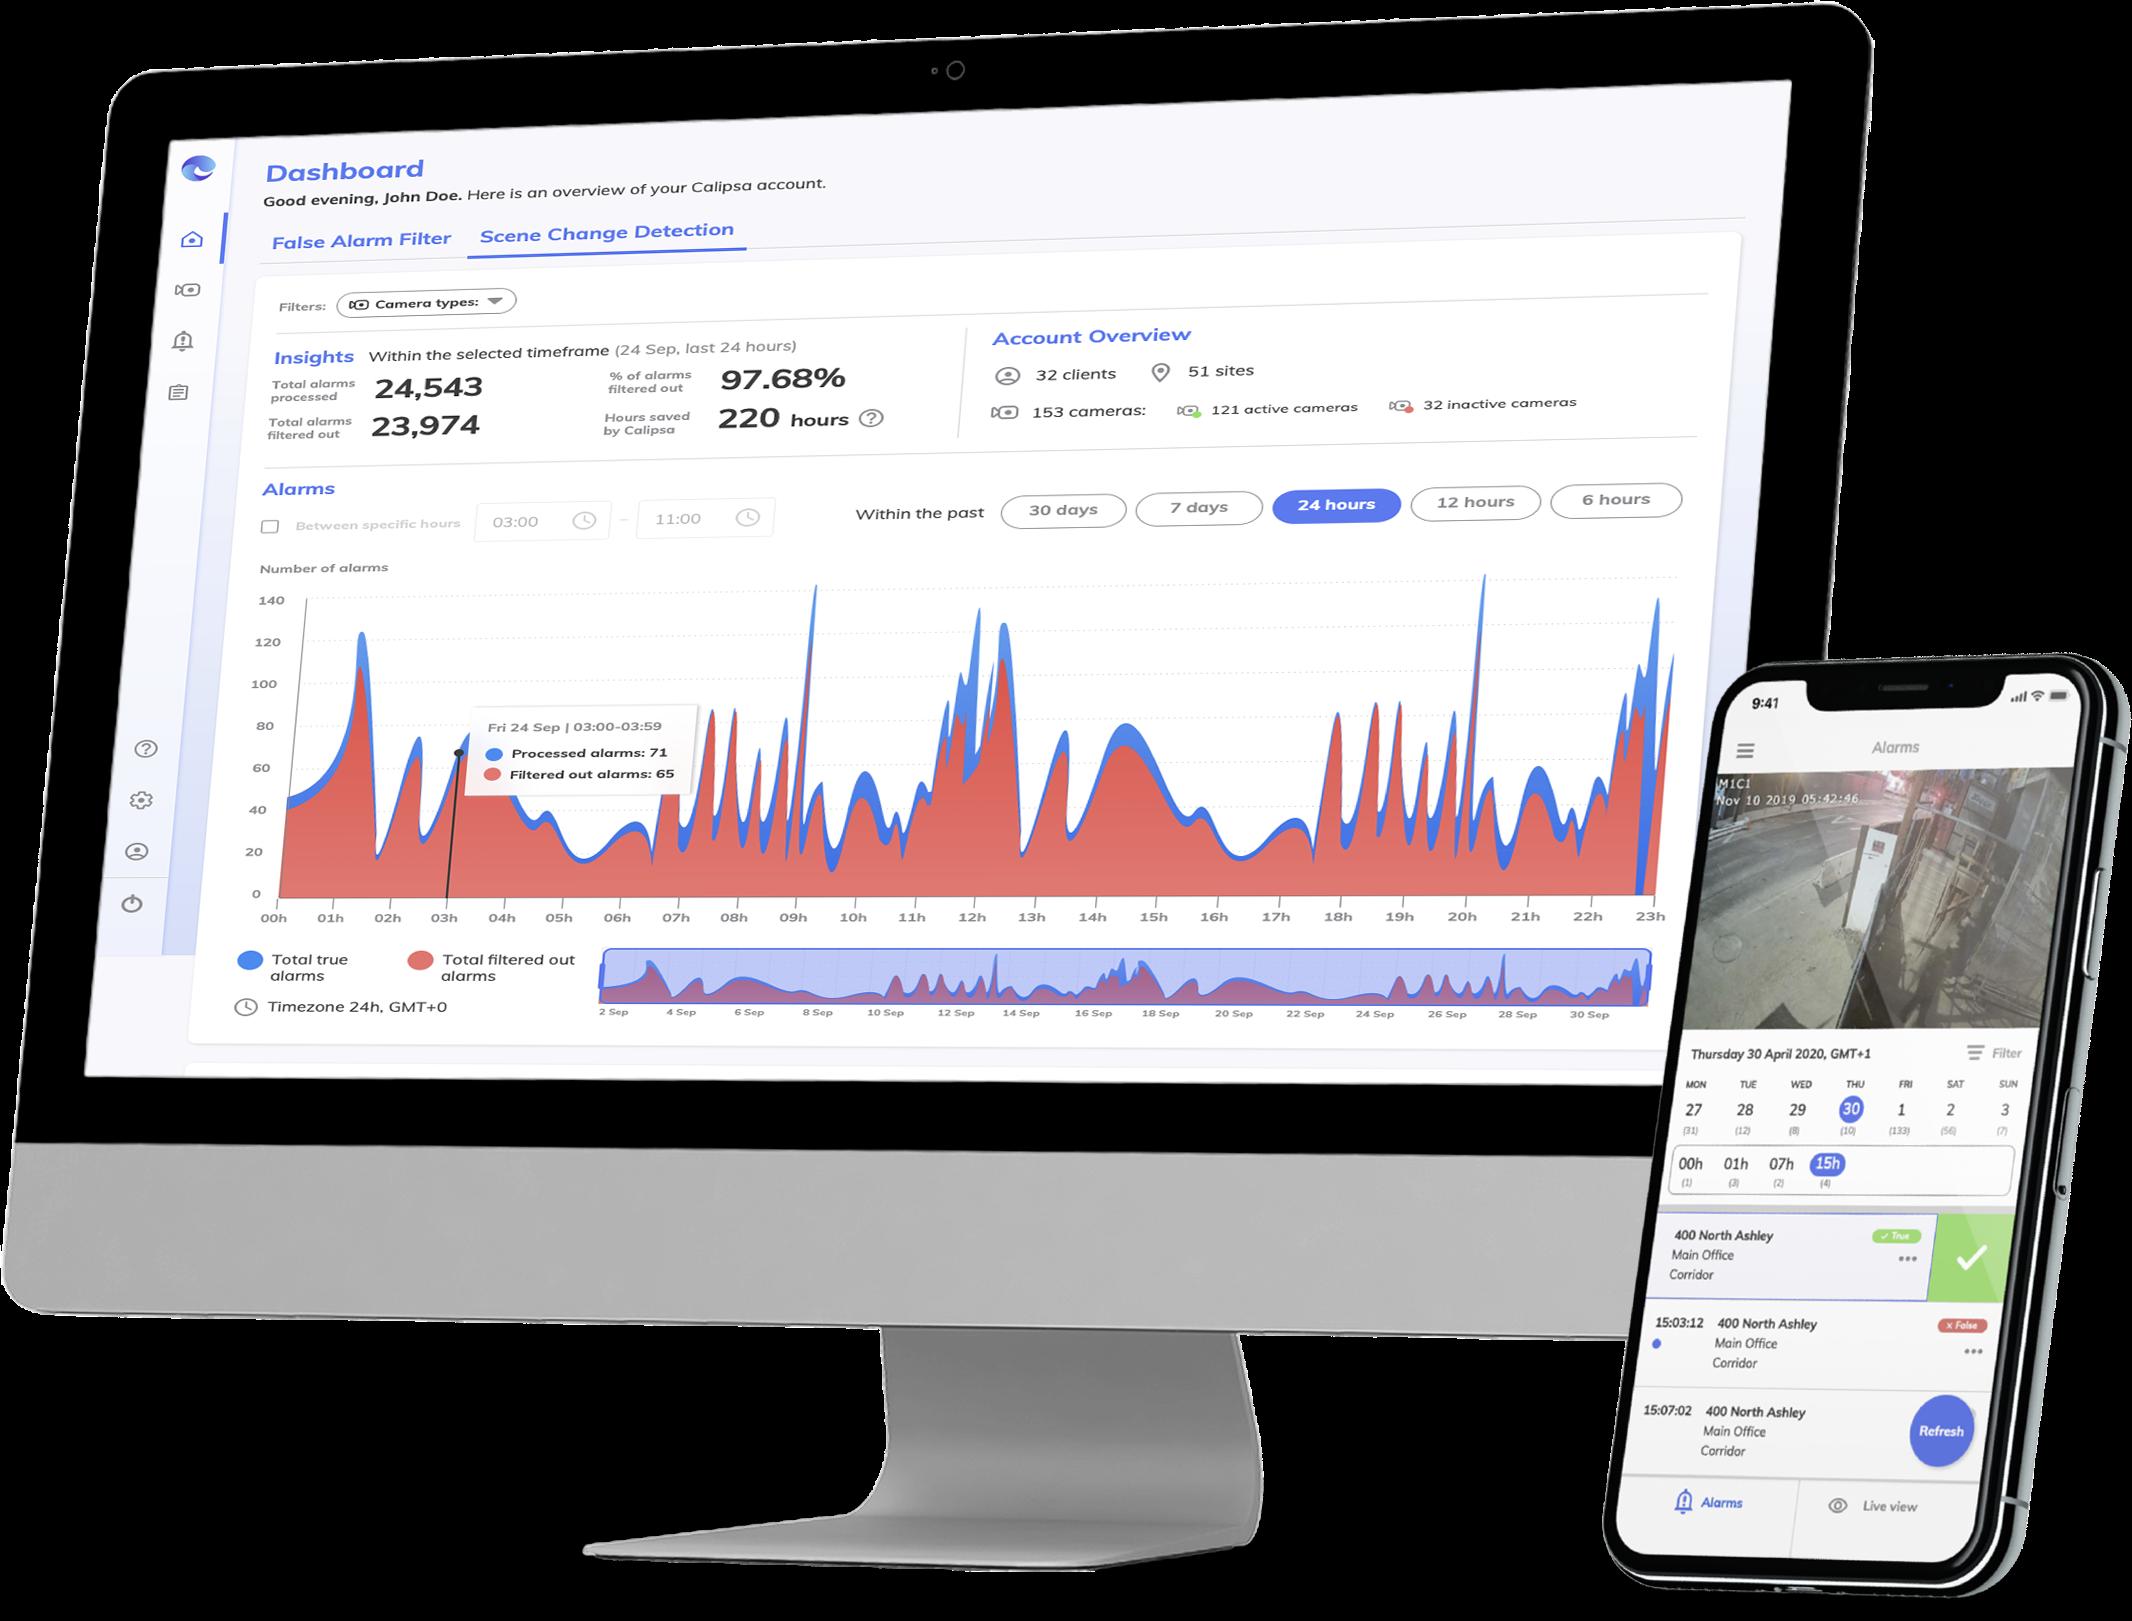 Calipsa Pro Analytics Advanced Video Analytics Platform